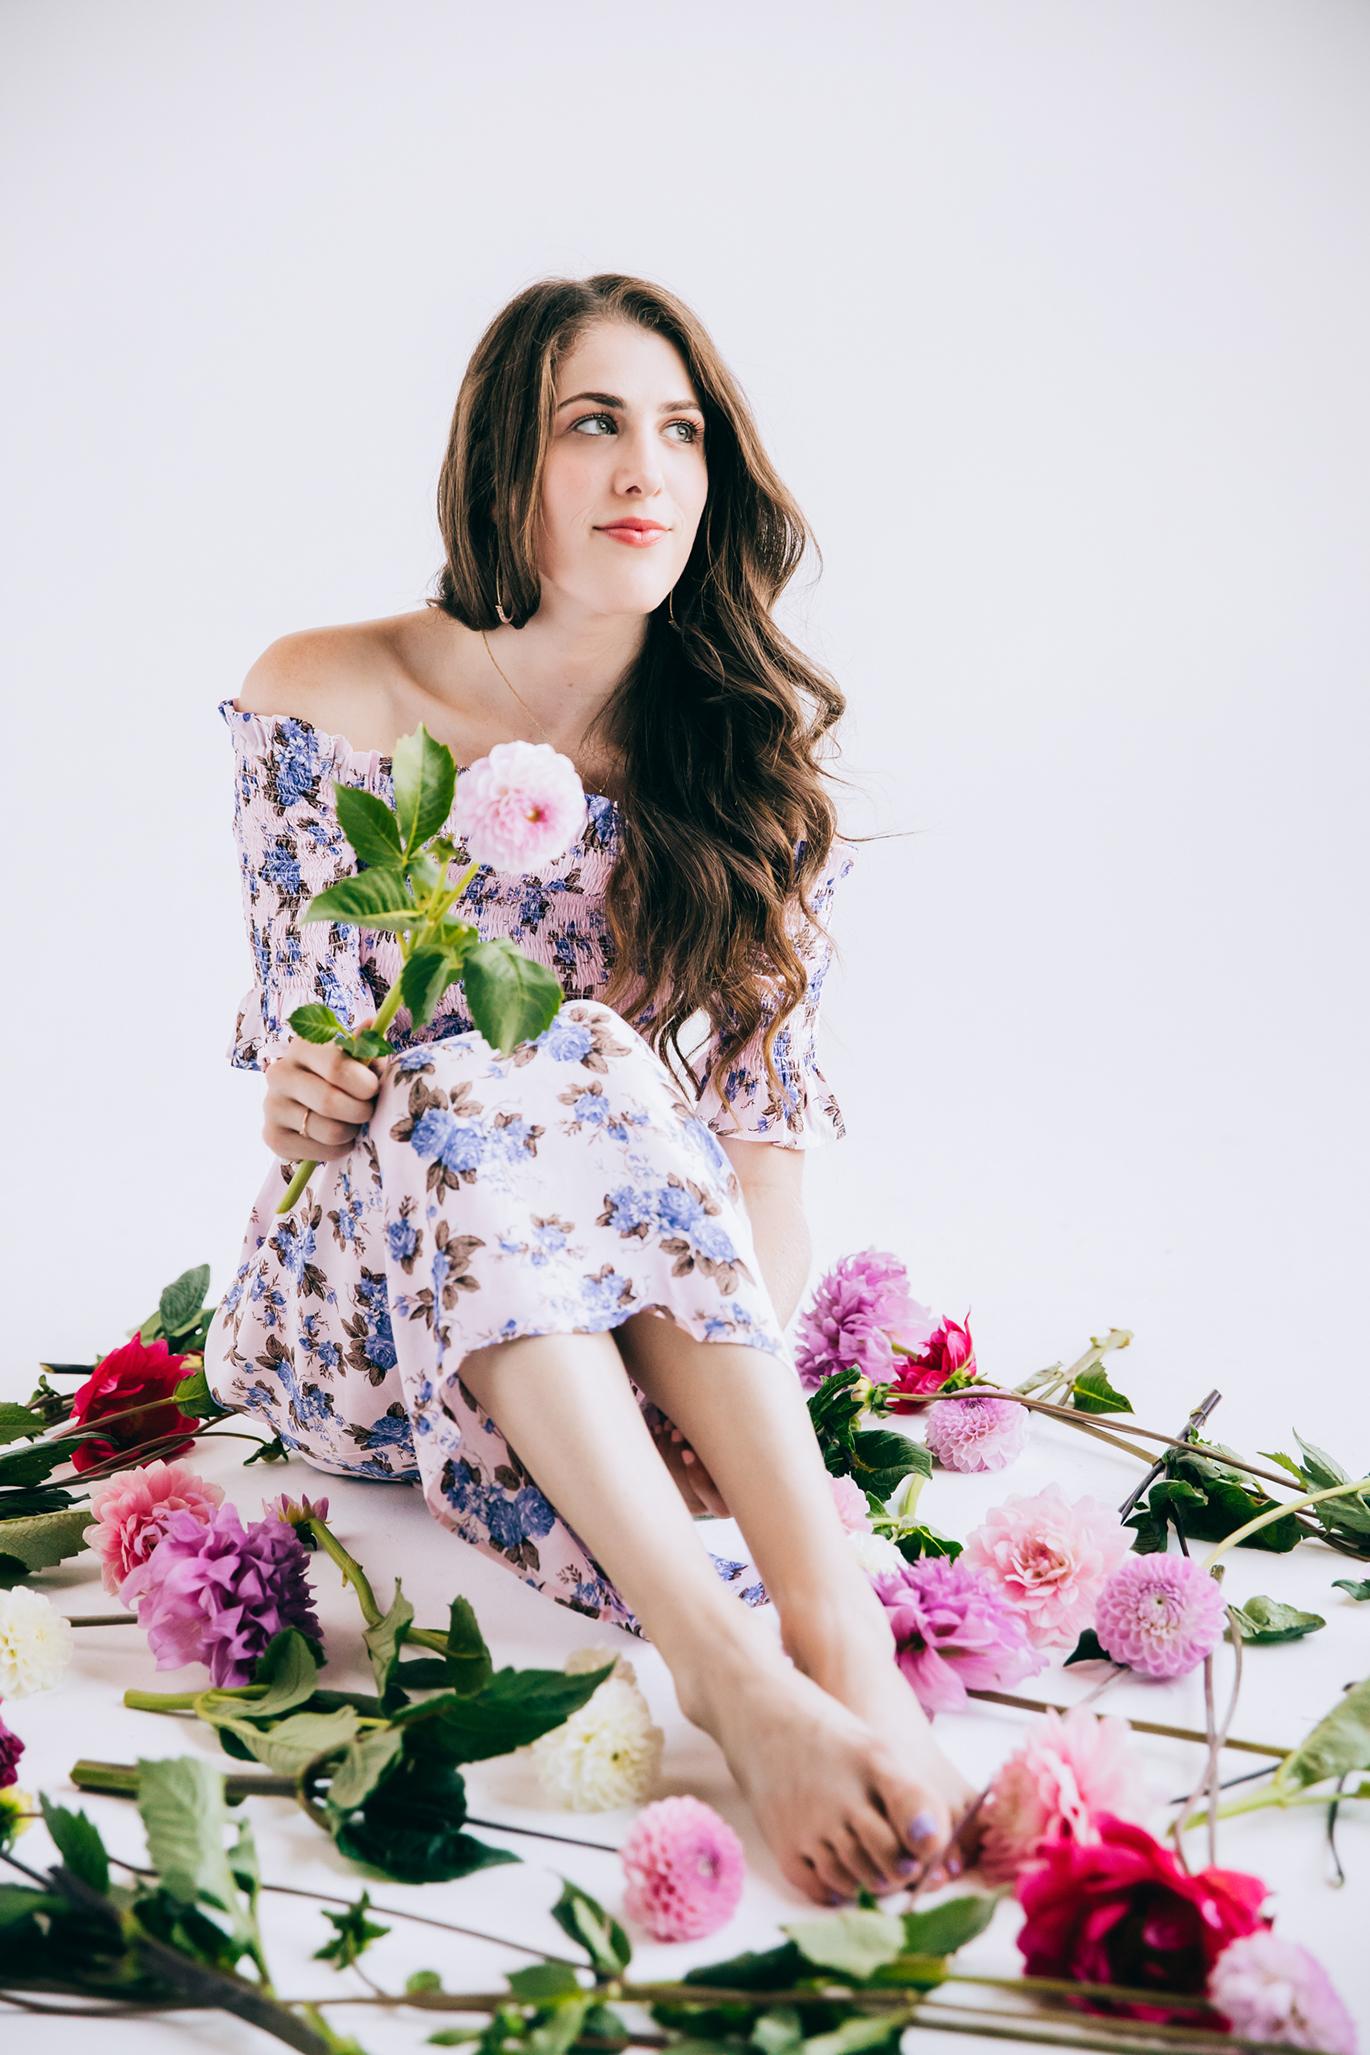 Los Angeles fashion beauty blogger